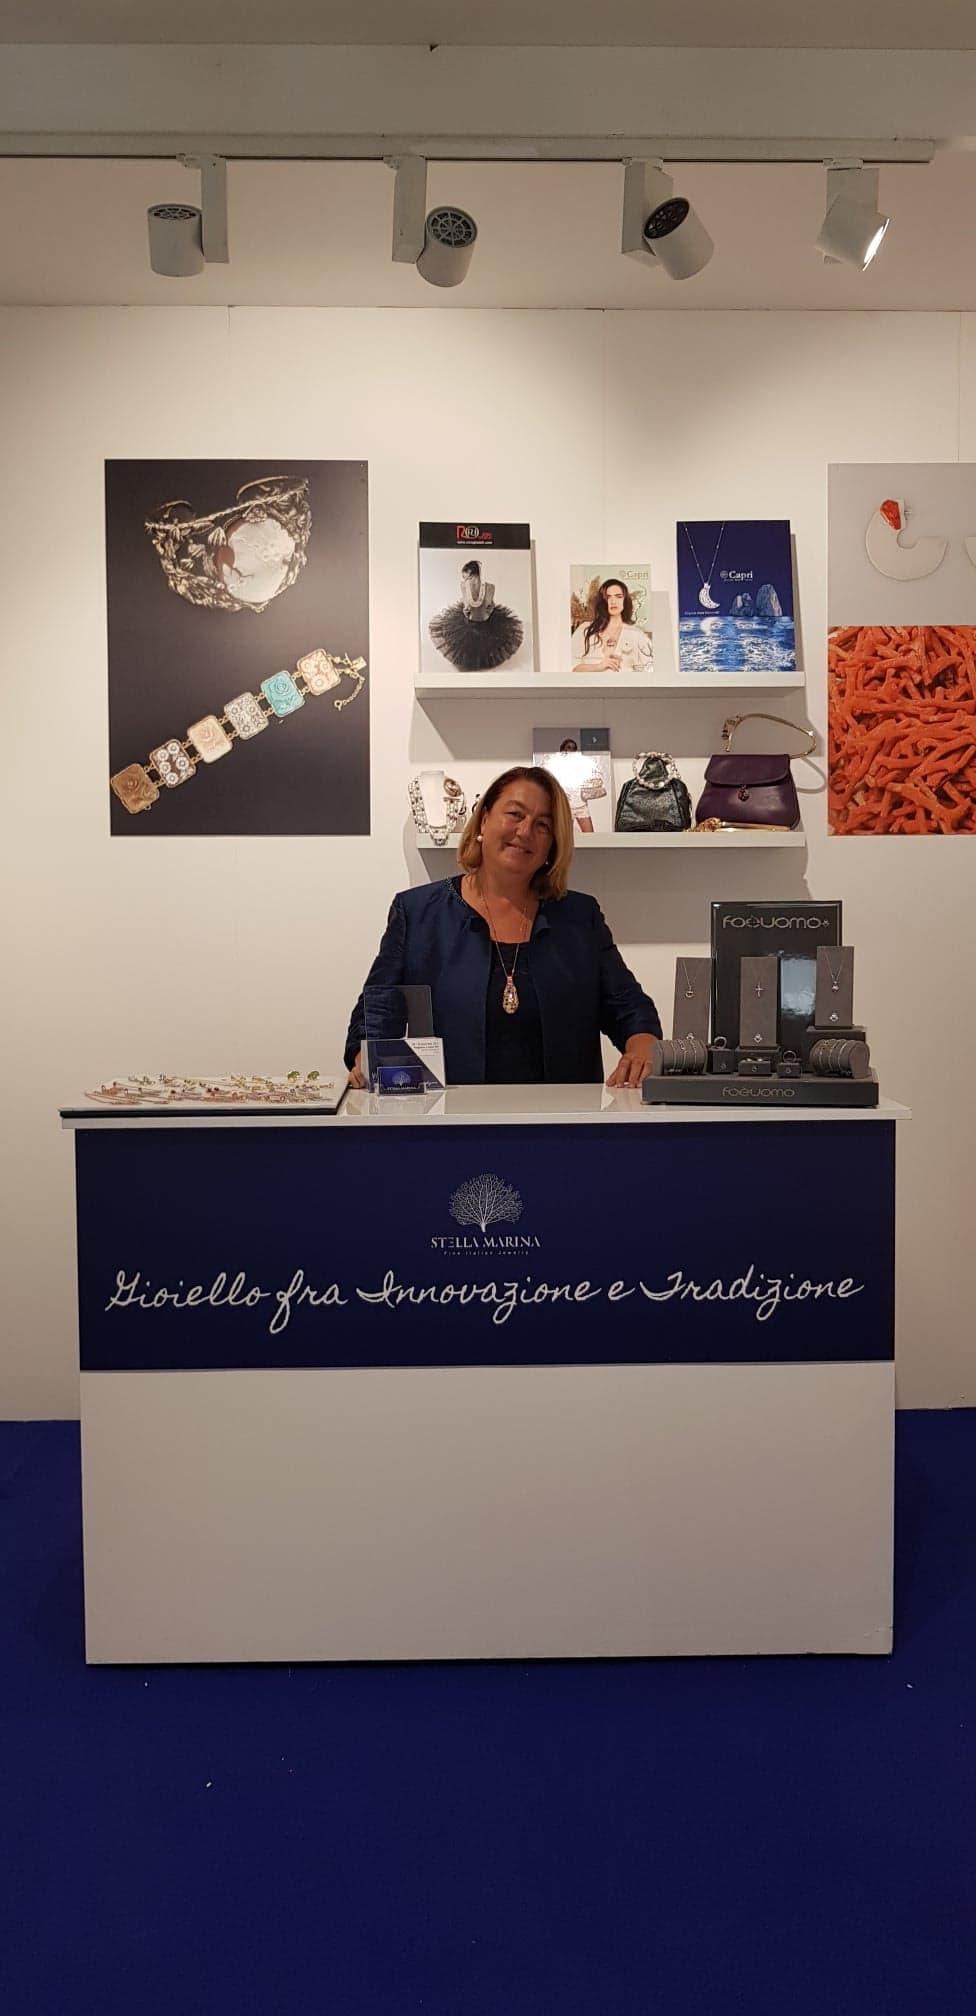 Marina Martinelli, General Manager of Stella Marina Jewelry